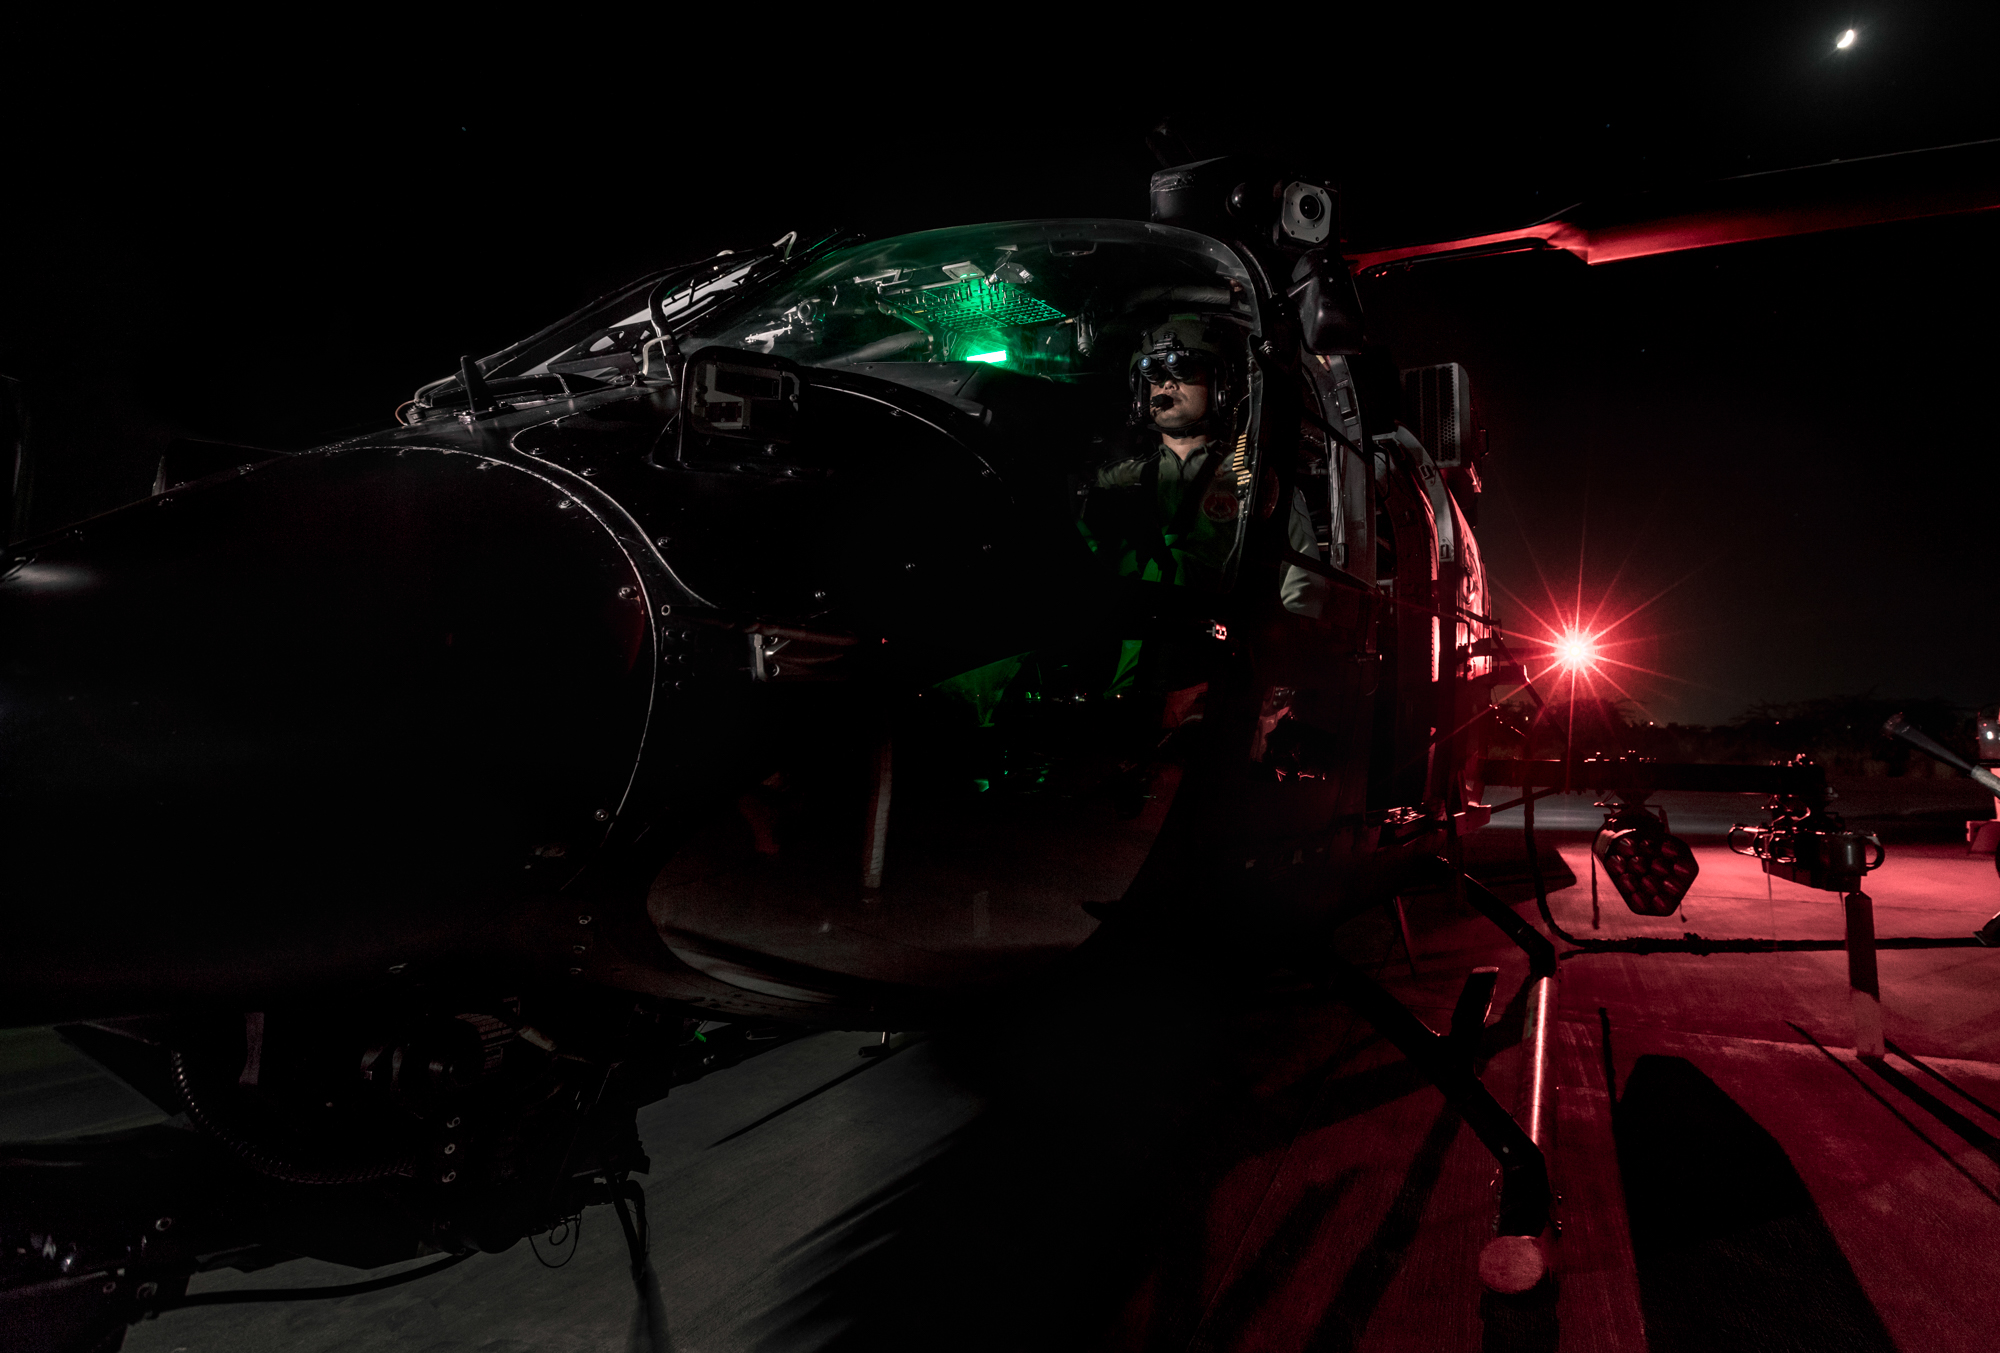 rudra exterior with pilot, night